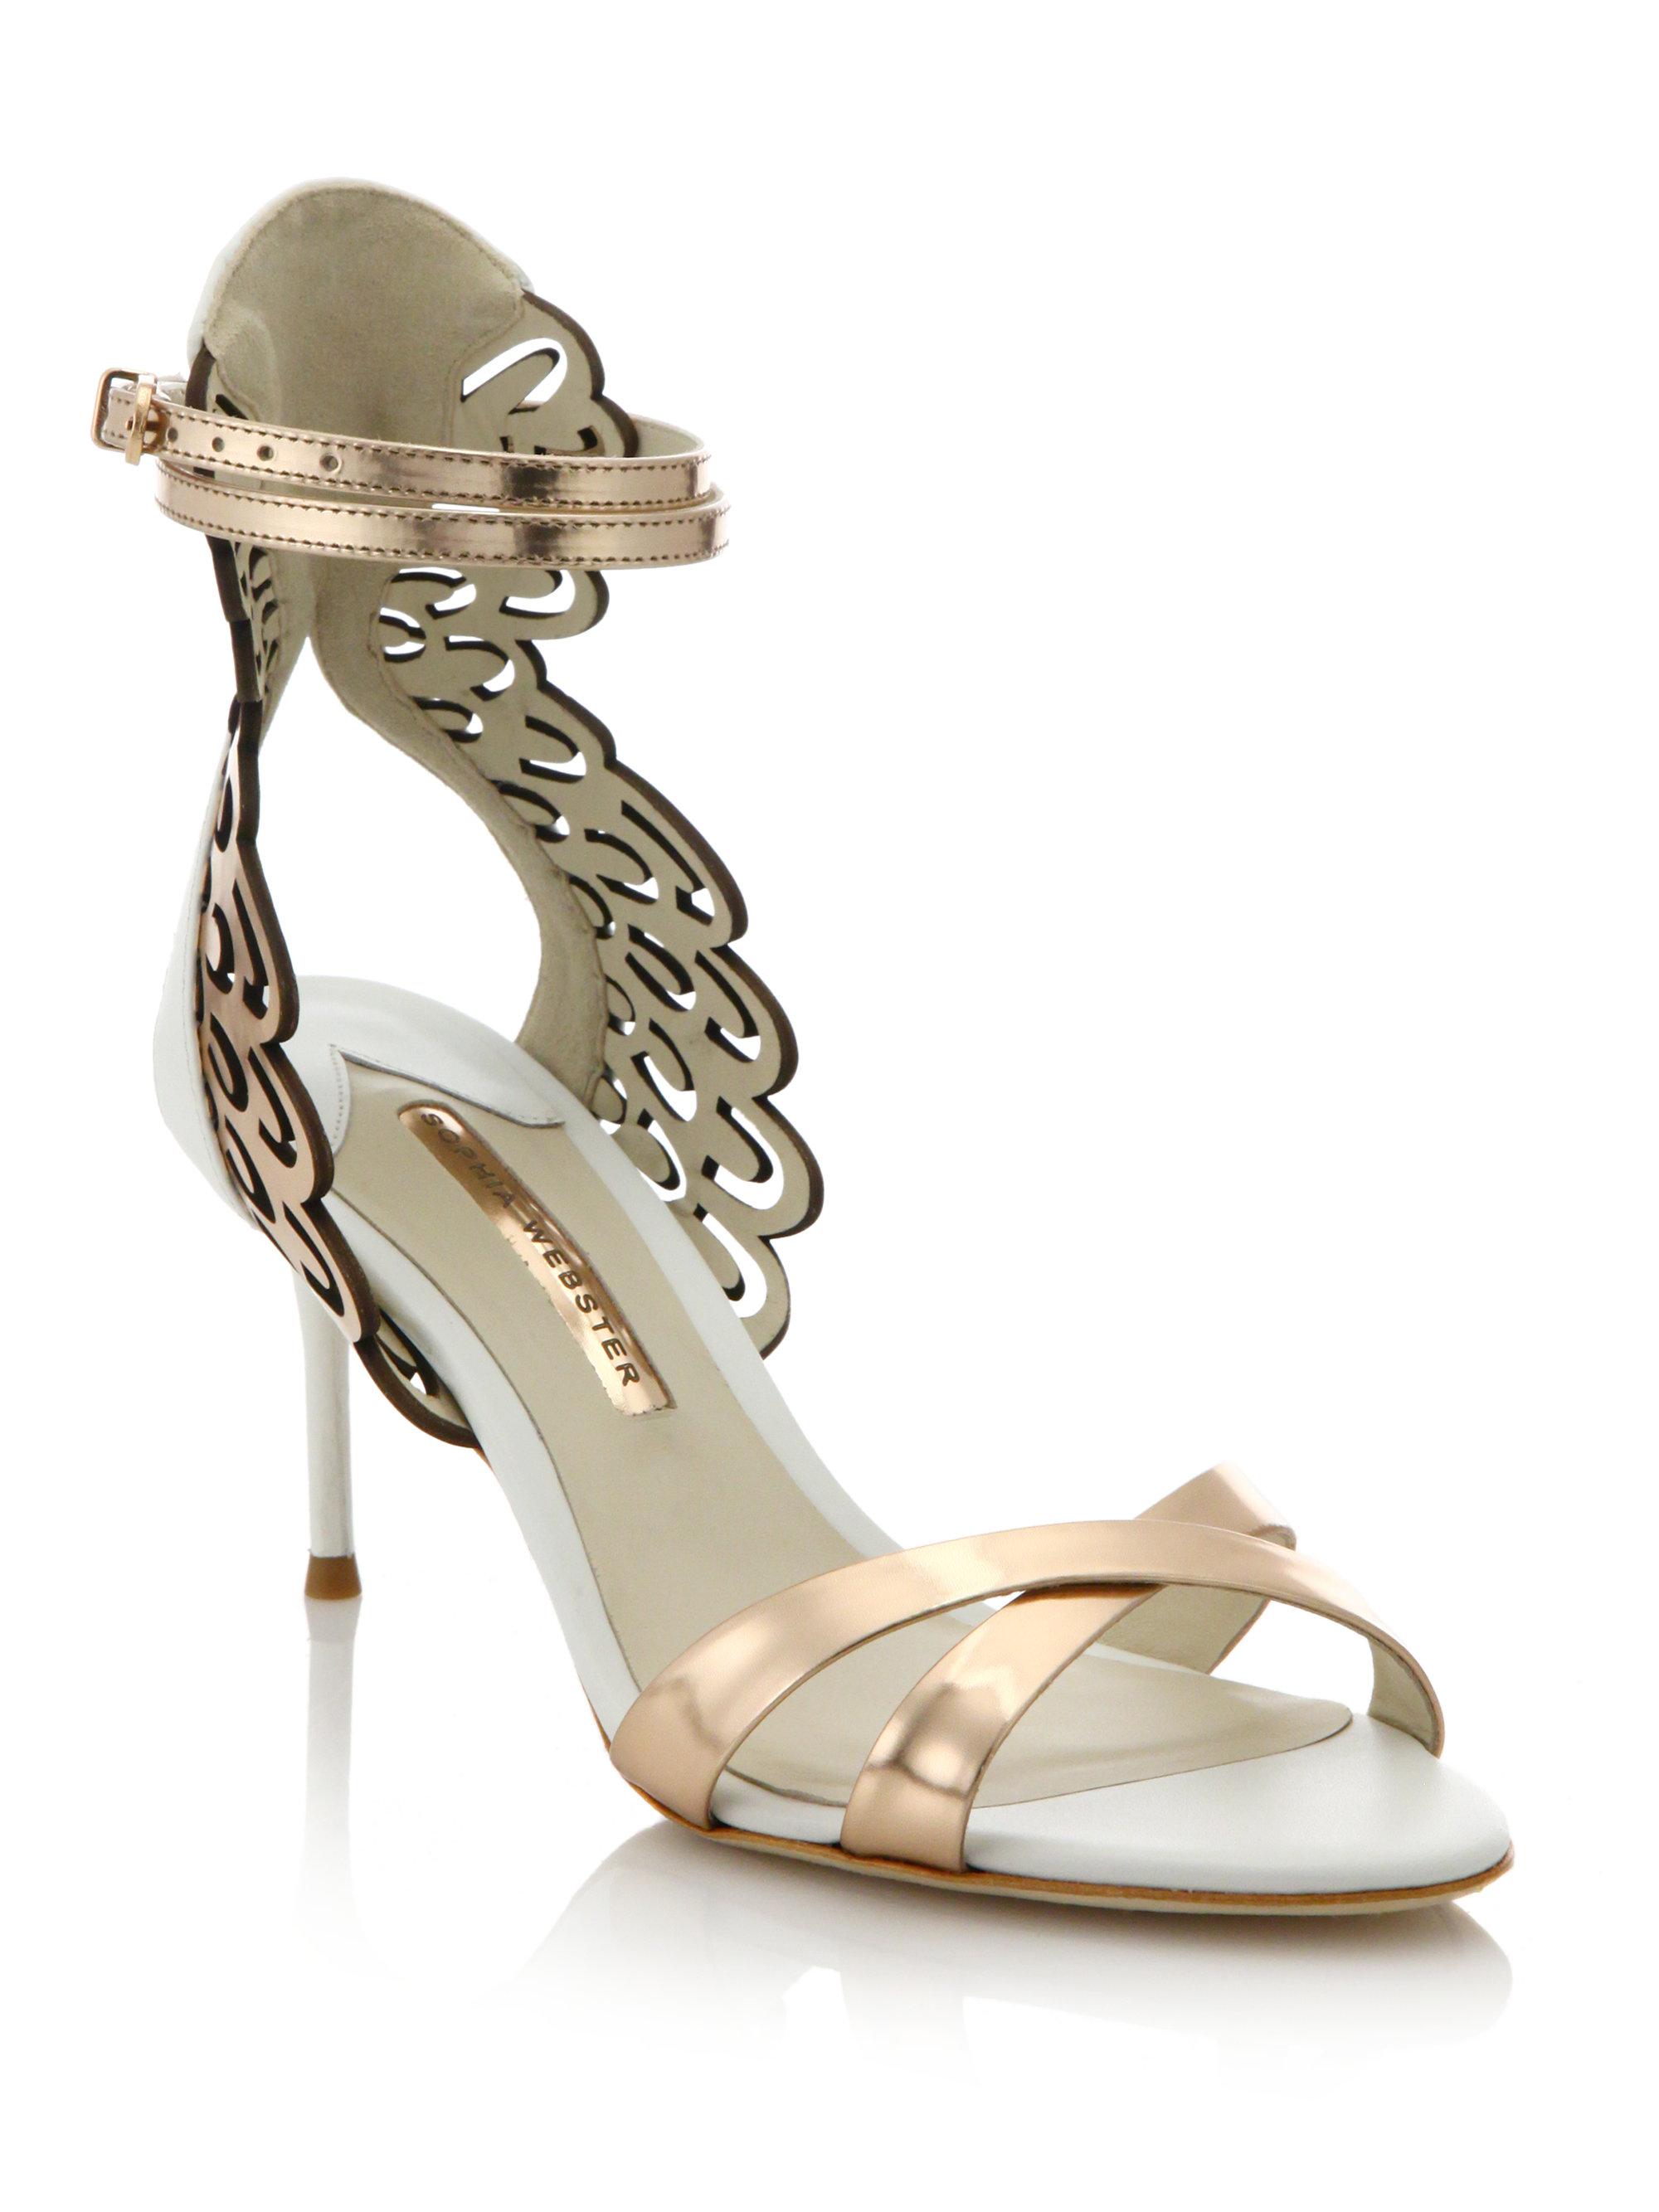 7c0dcd2dcbd Lyst - Sophia Webster Micah Angel Wing Metallic Leather Sandals in ...